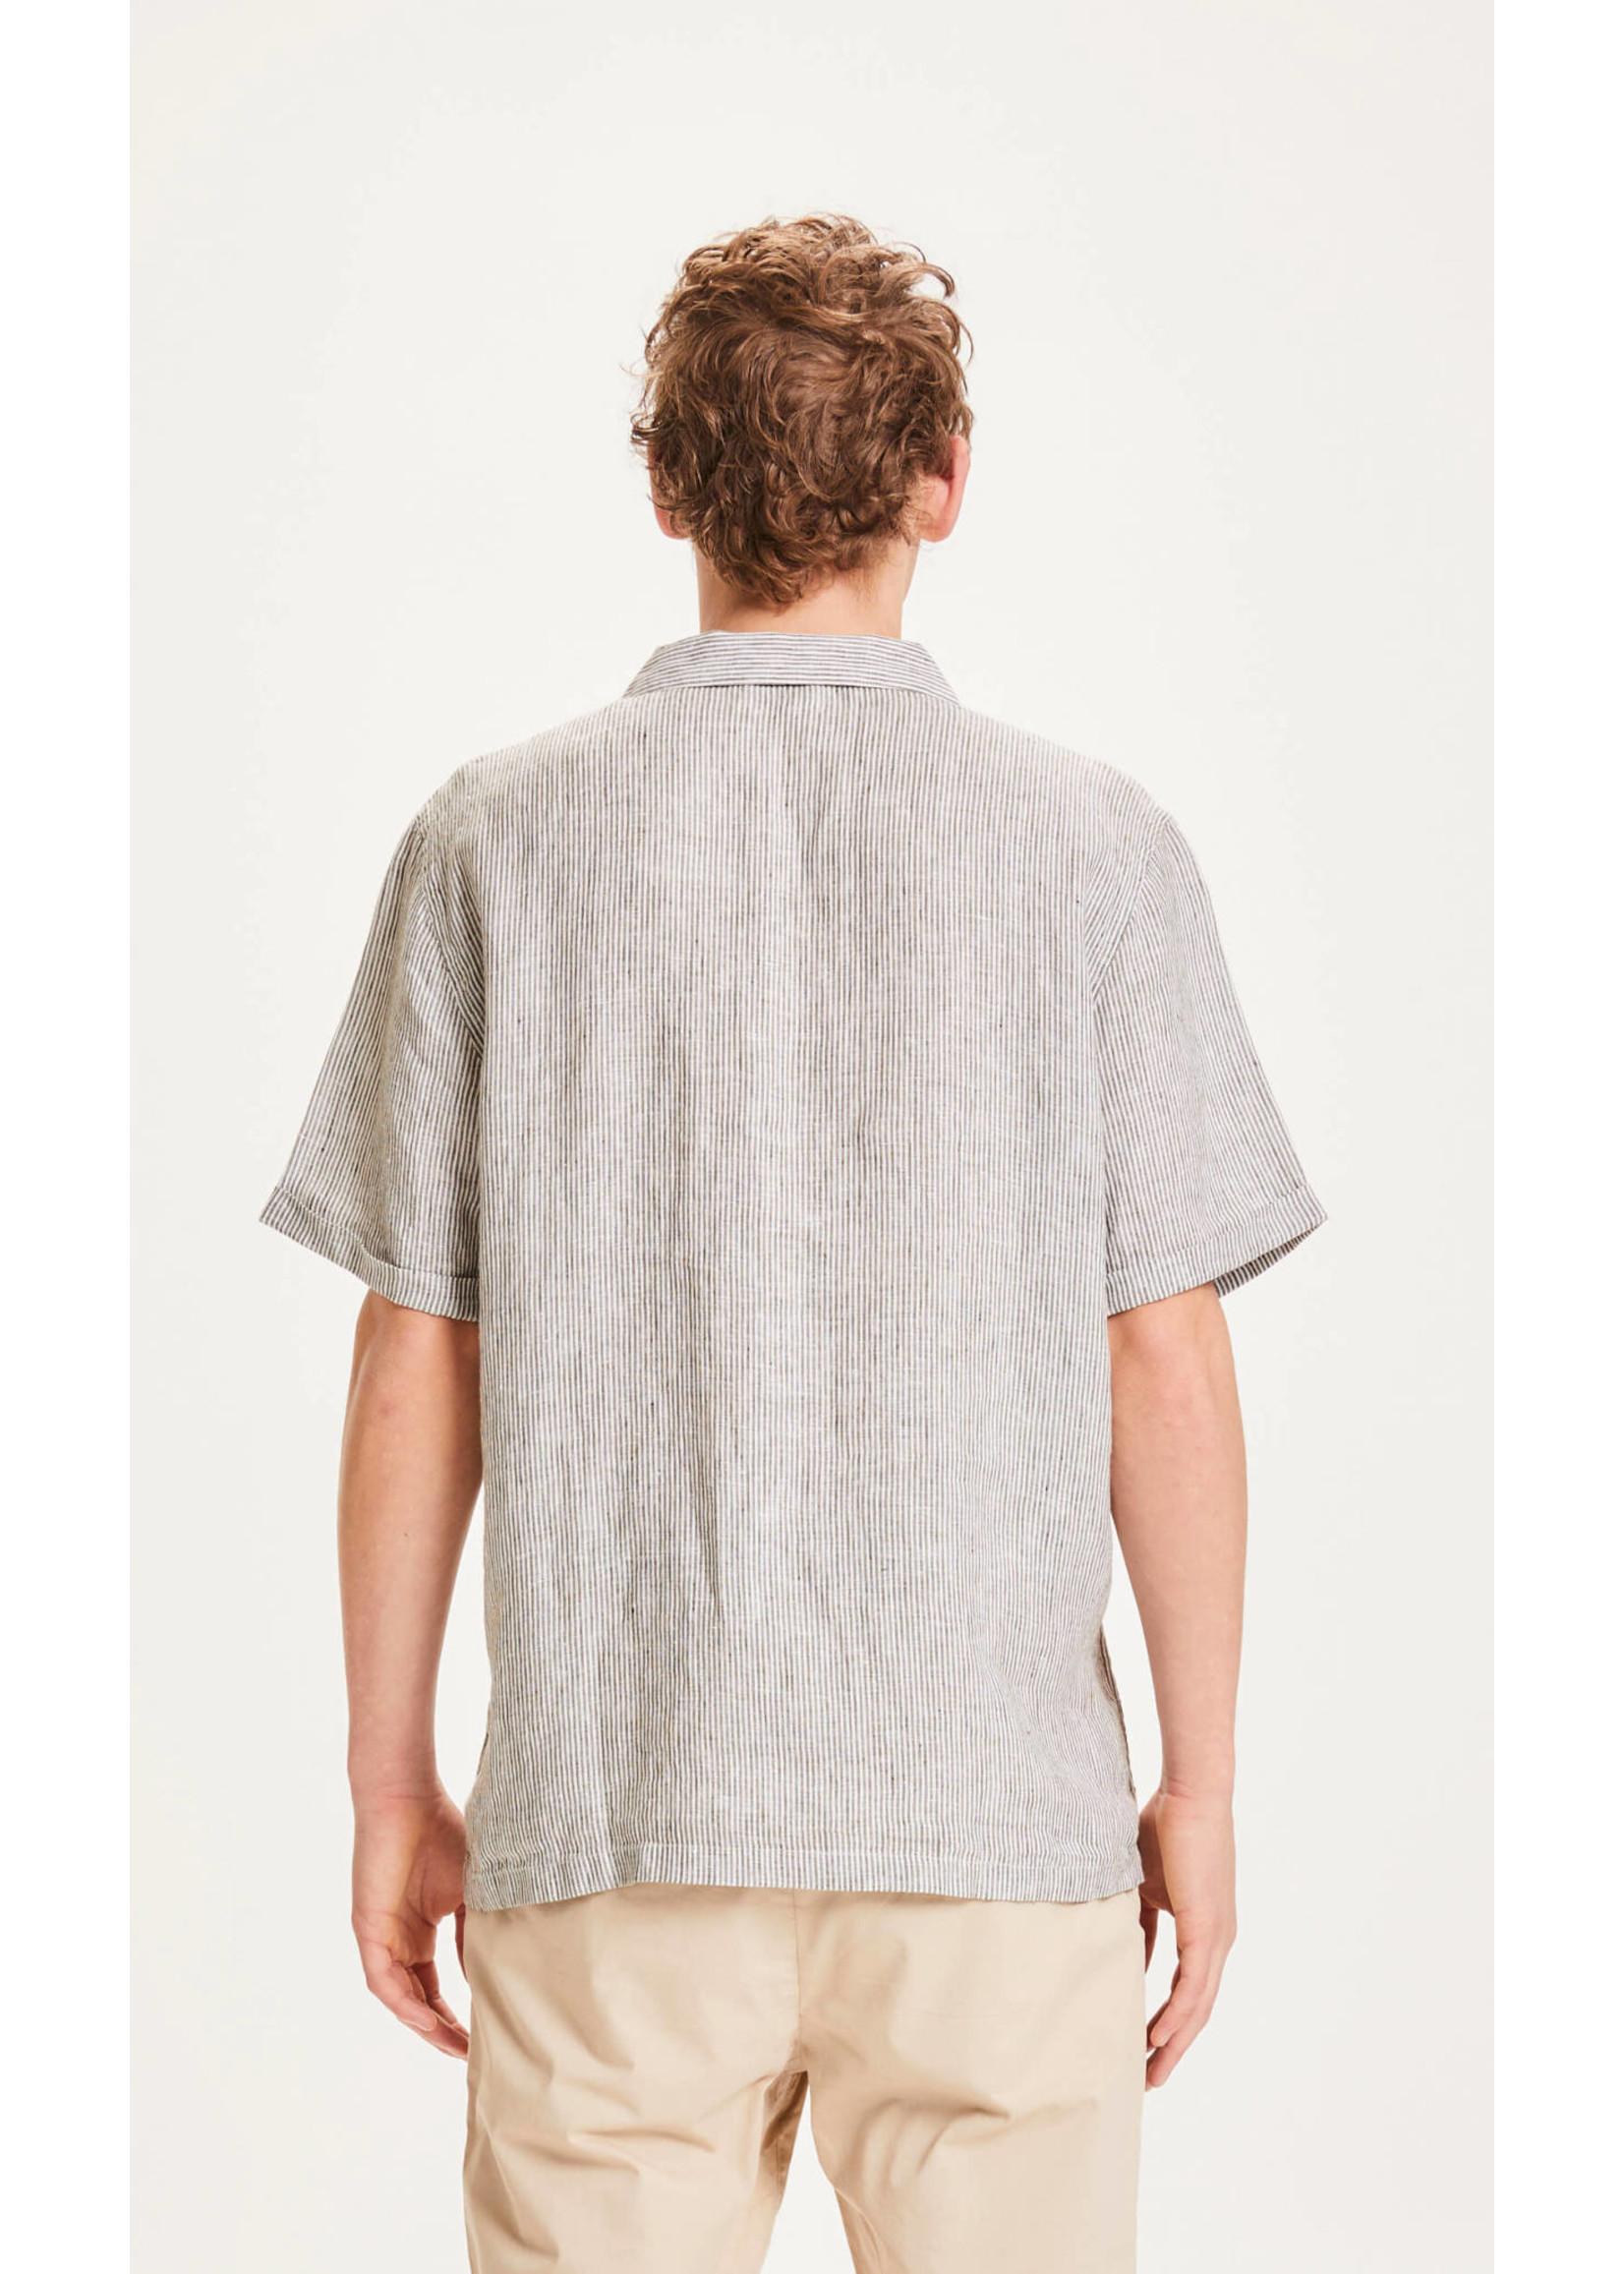 KnowledgeCotton KnowledgeCotton WAVE SS striped shirt